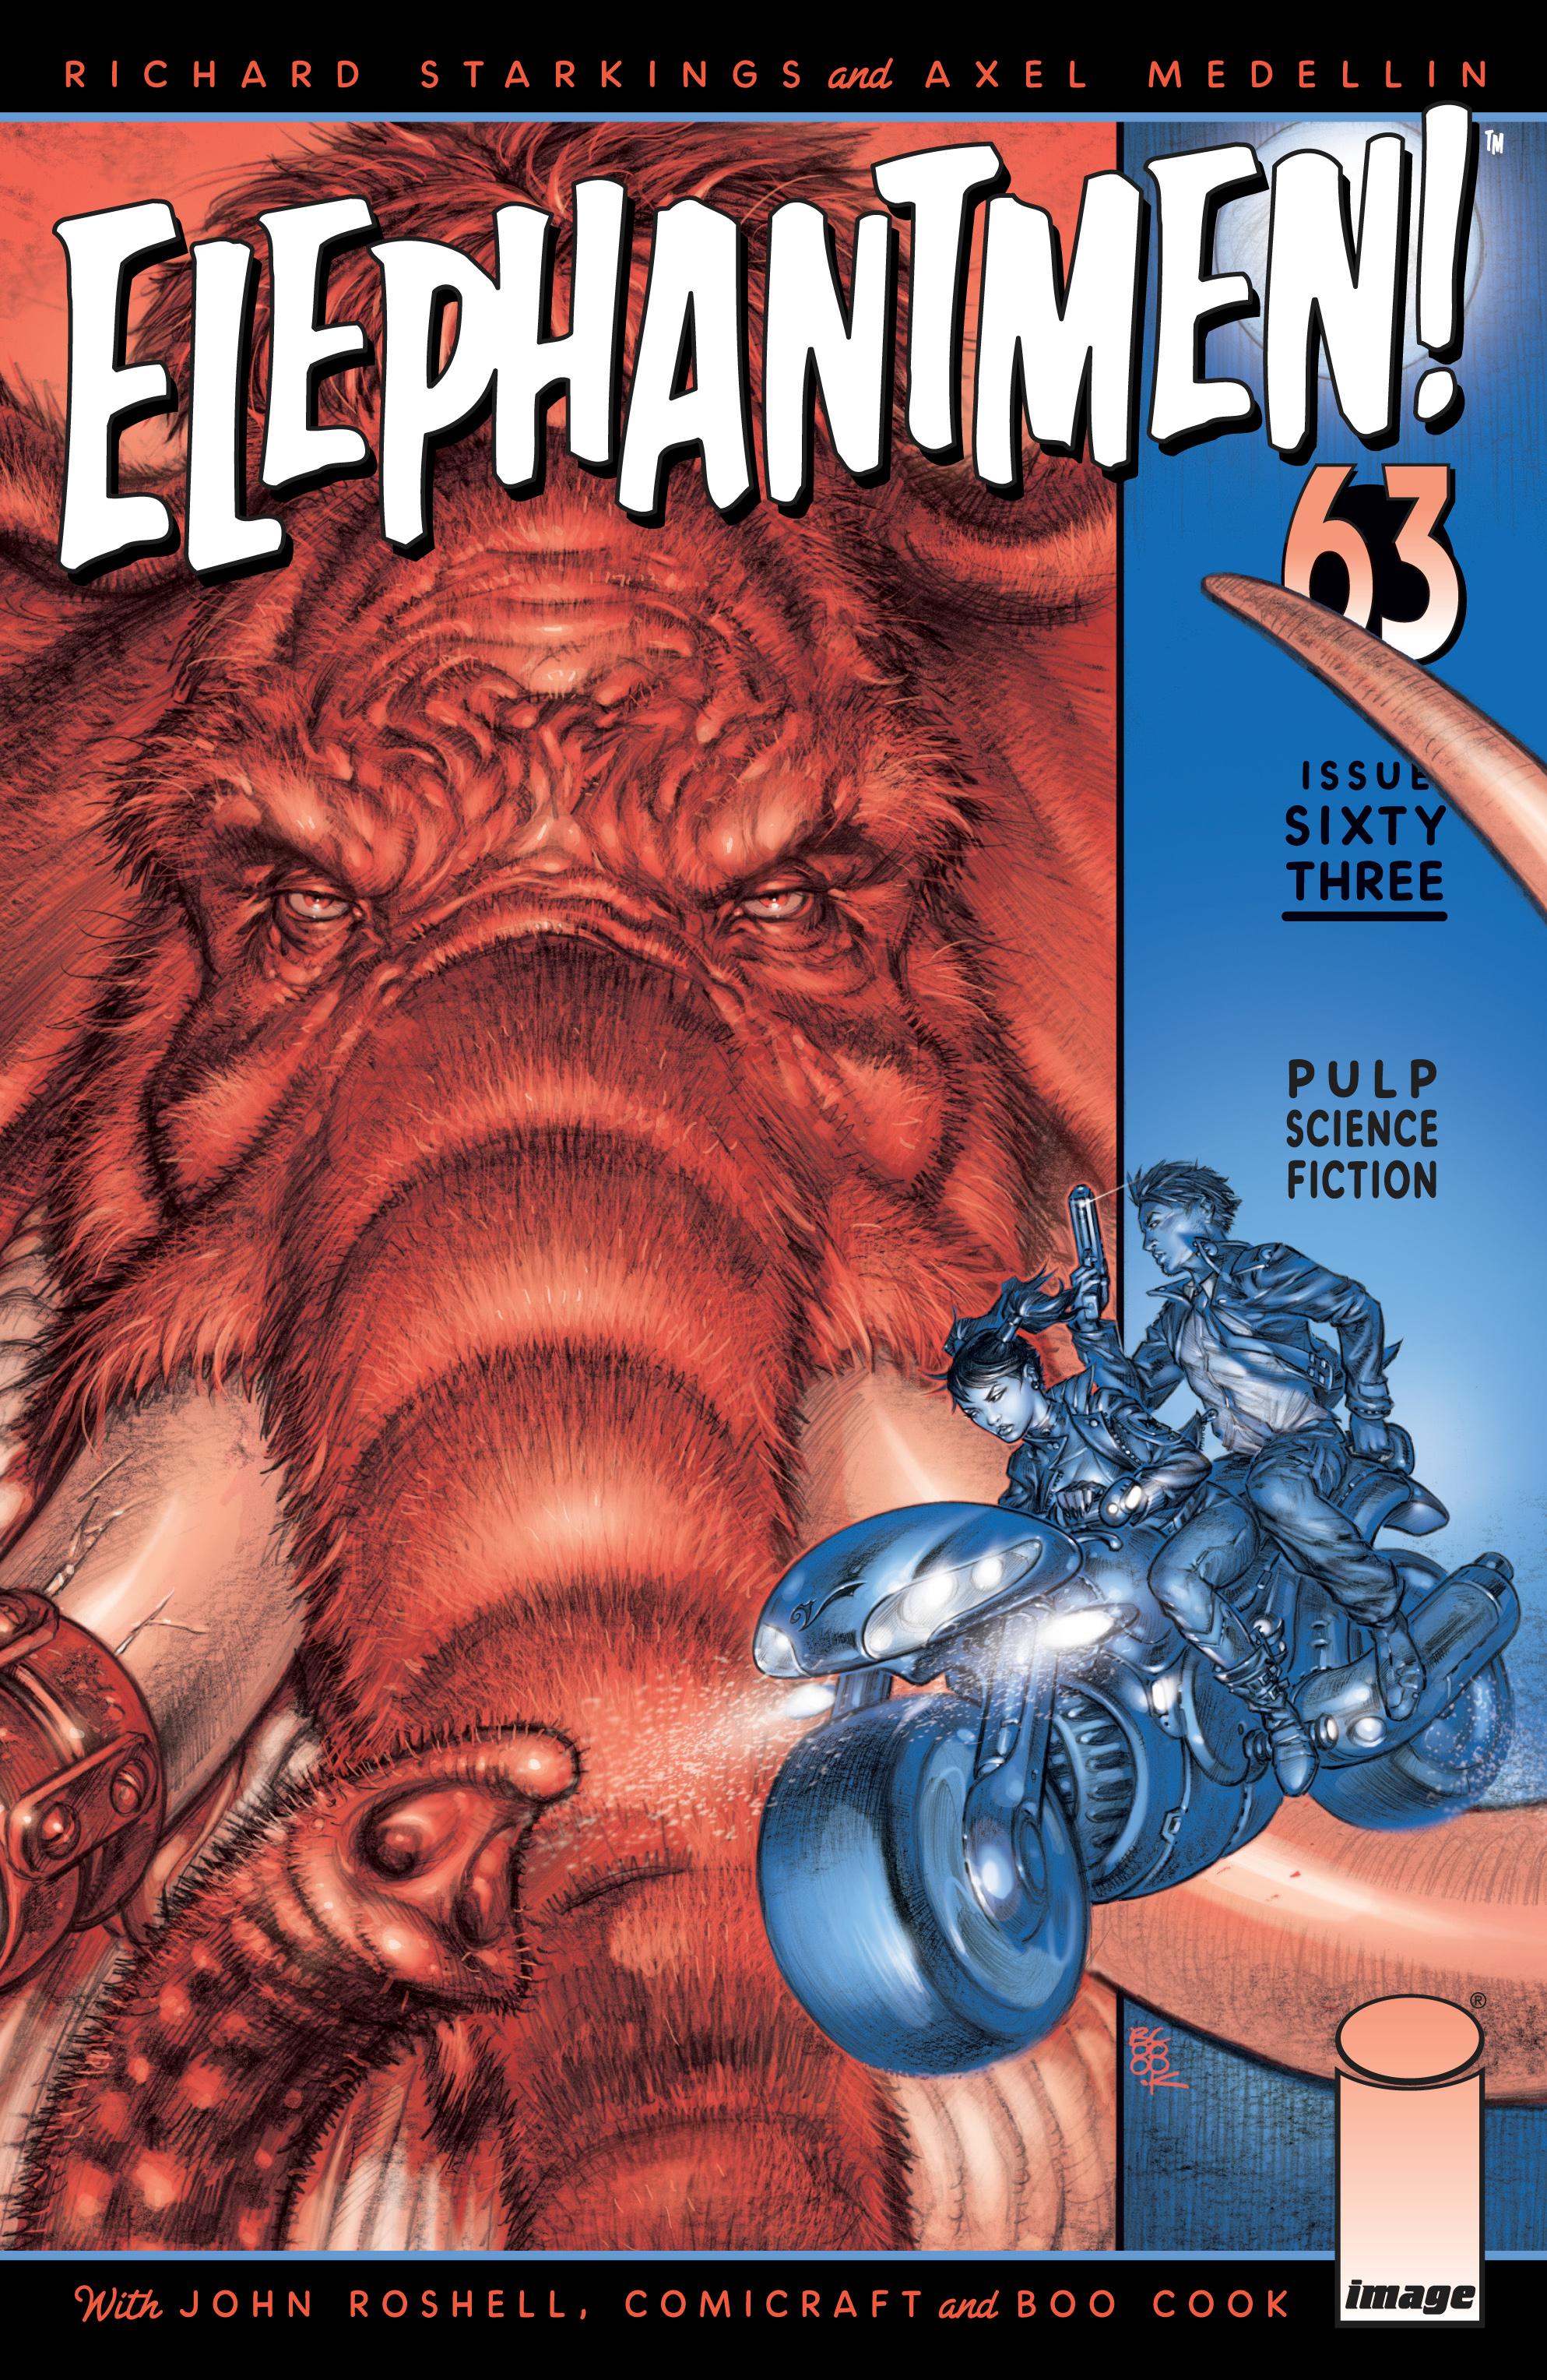 ELEPHANTMEN US IMAGE COMIC VOL.1 # 63///'15